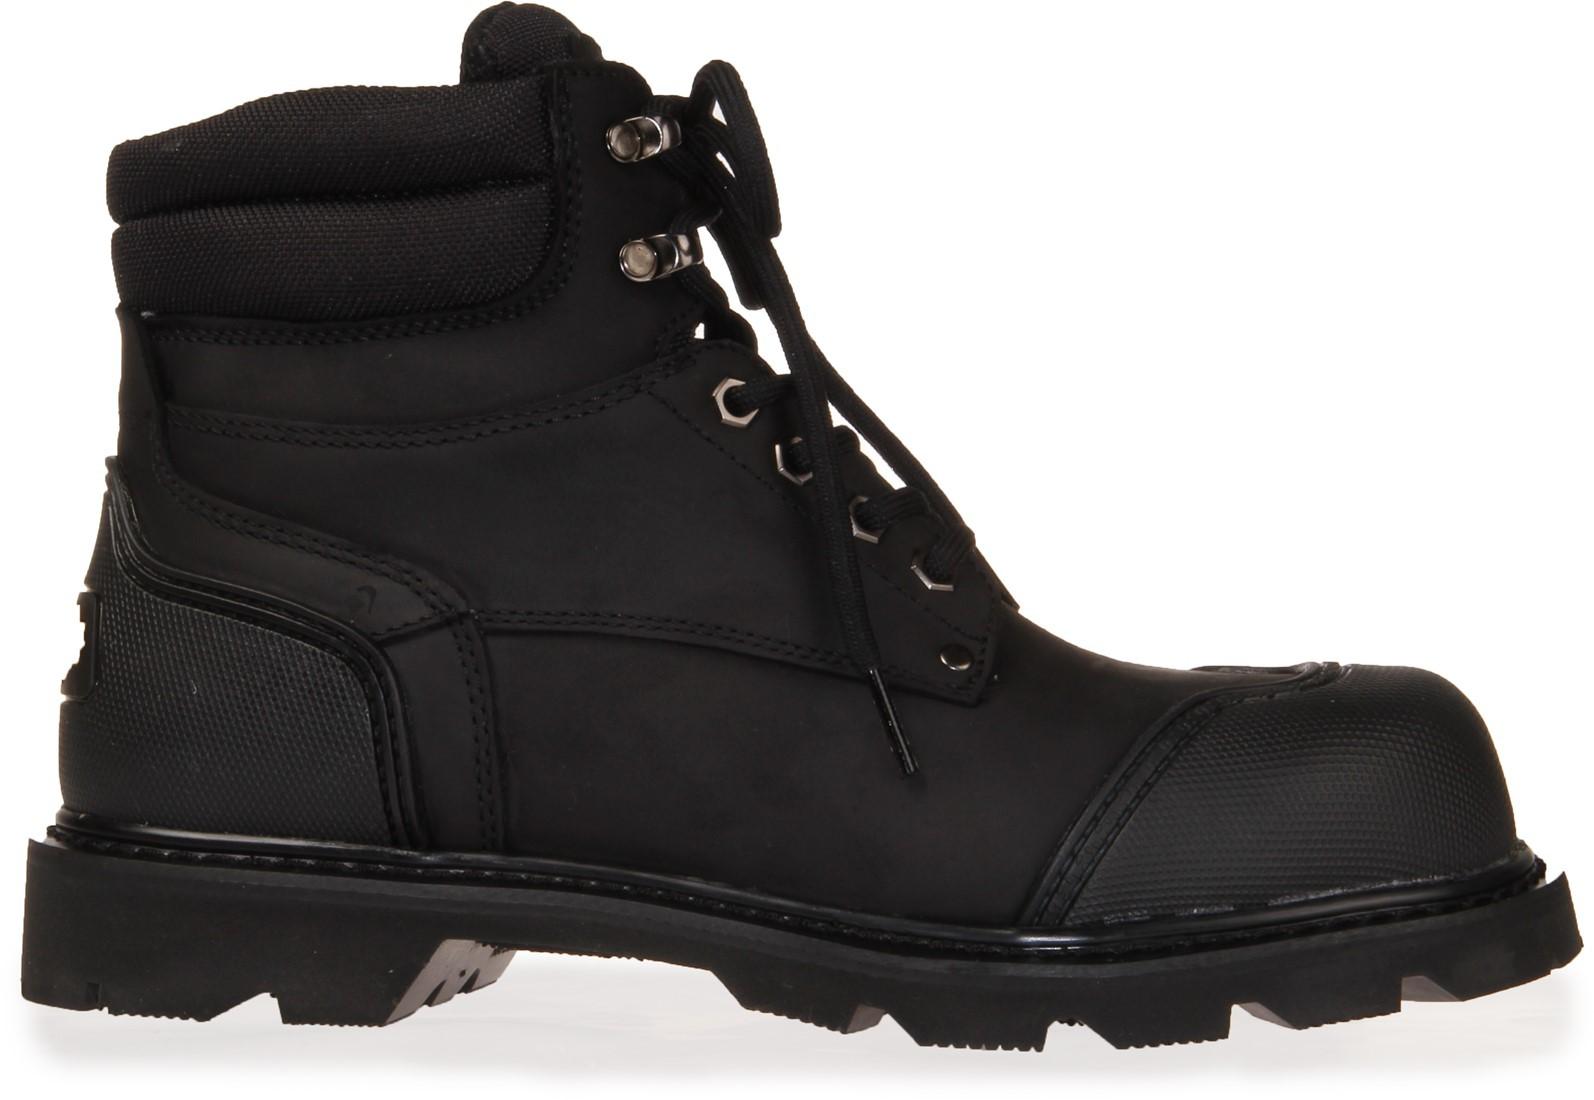 Blackstone 530 S3